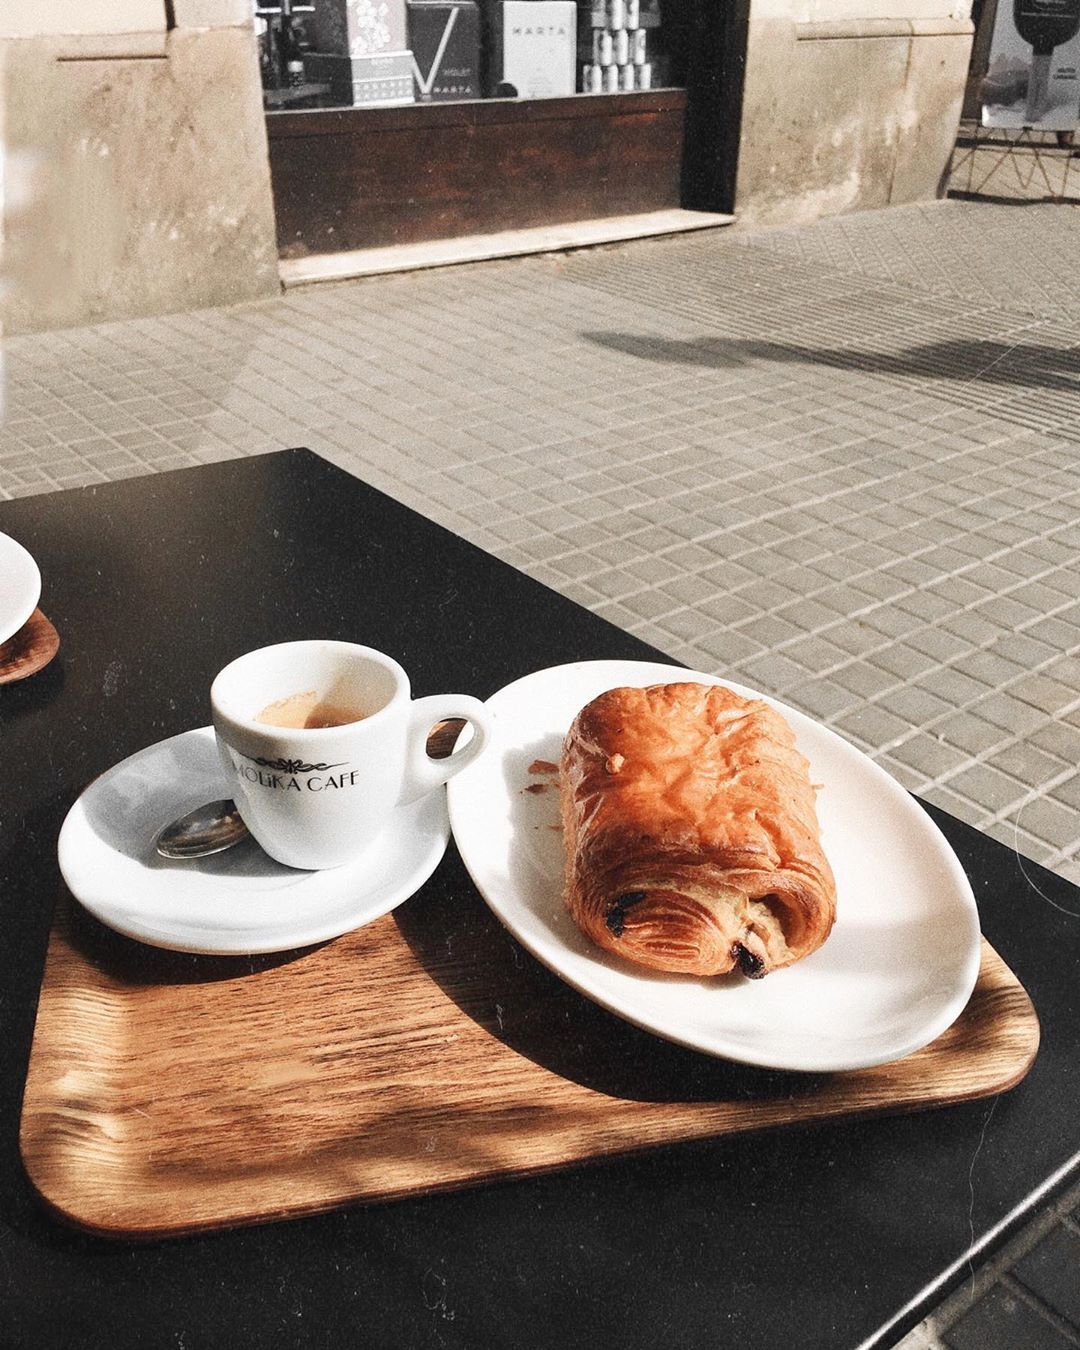 taraleighrose-barcelona-cafe-taraleigh-fashion-influencer